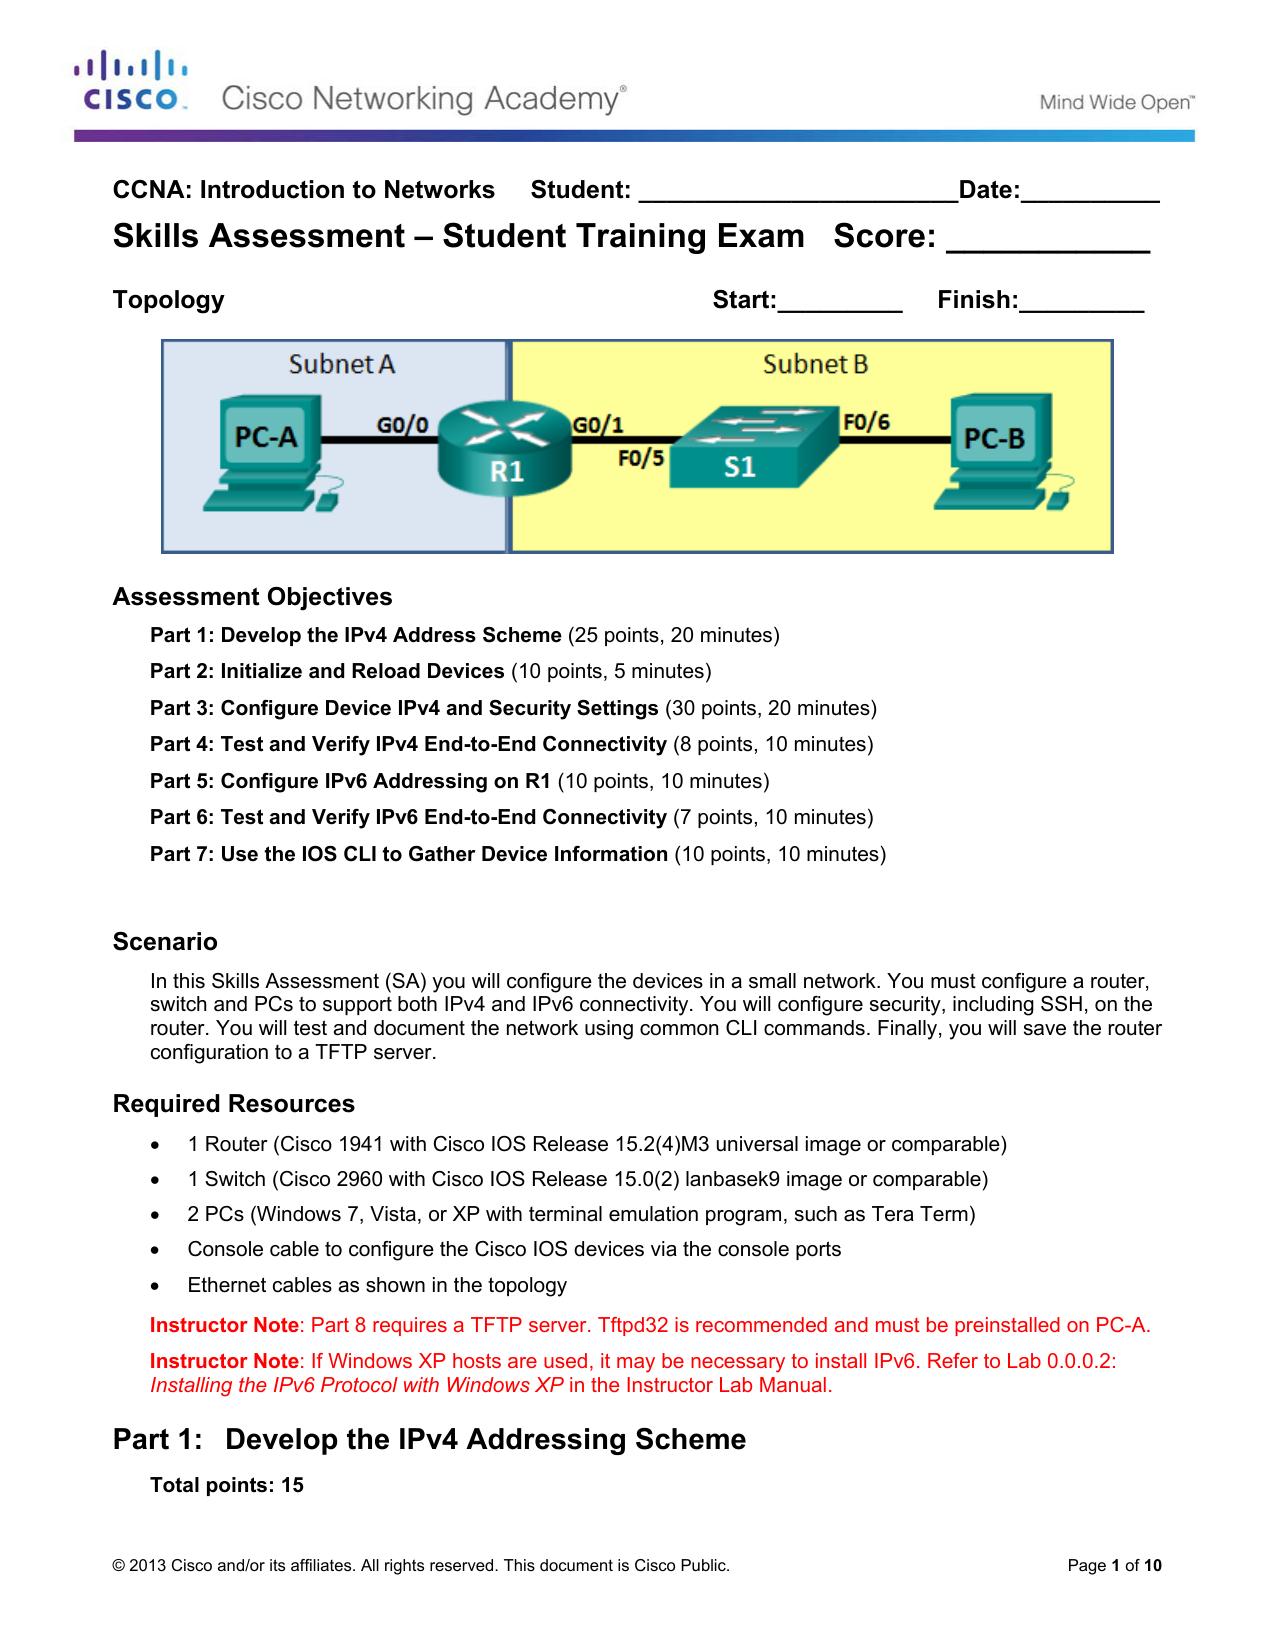 Skills Assessment – Student Training Exam Score | manualzz com